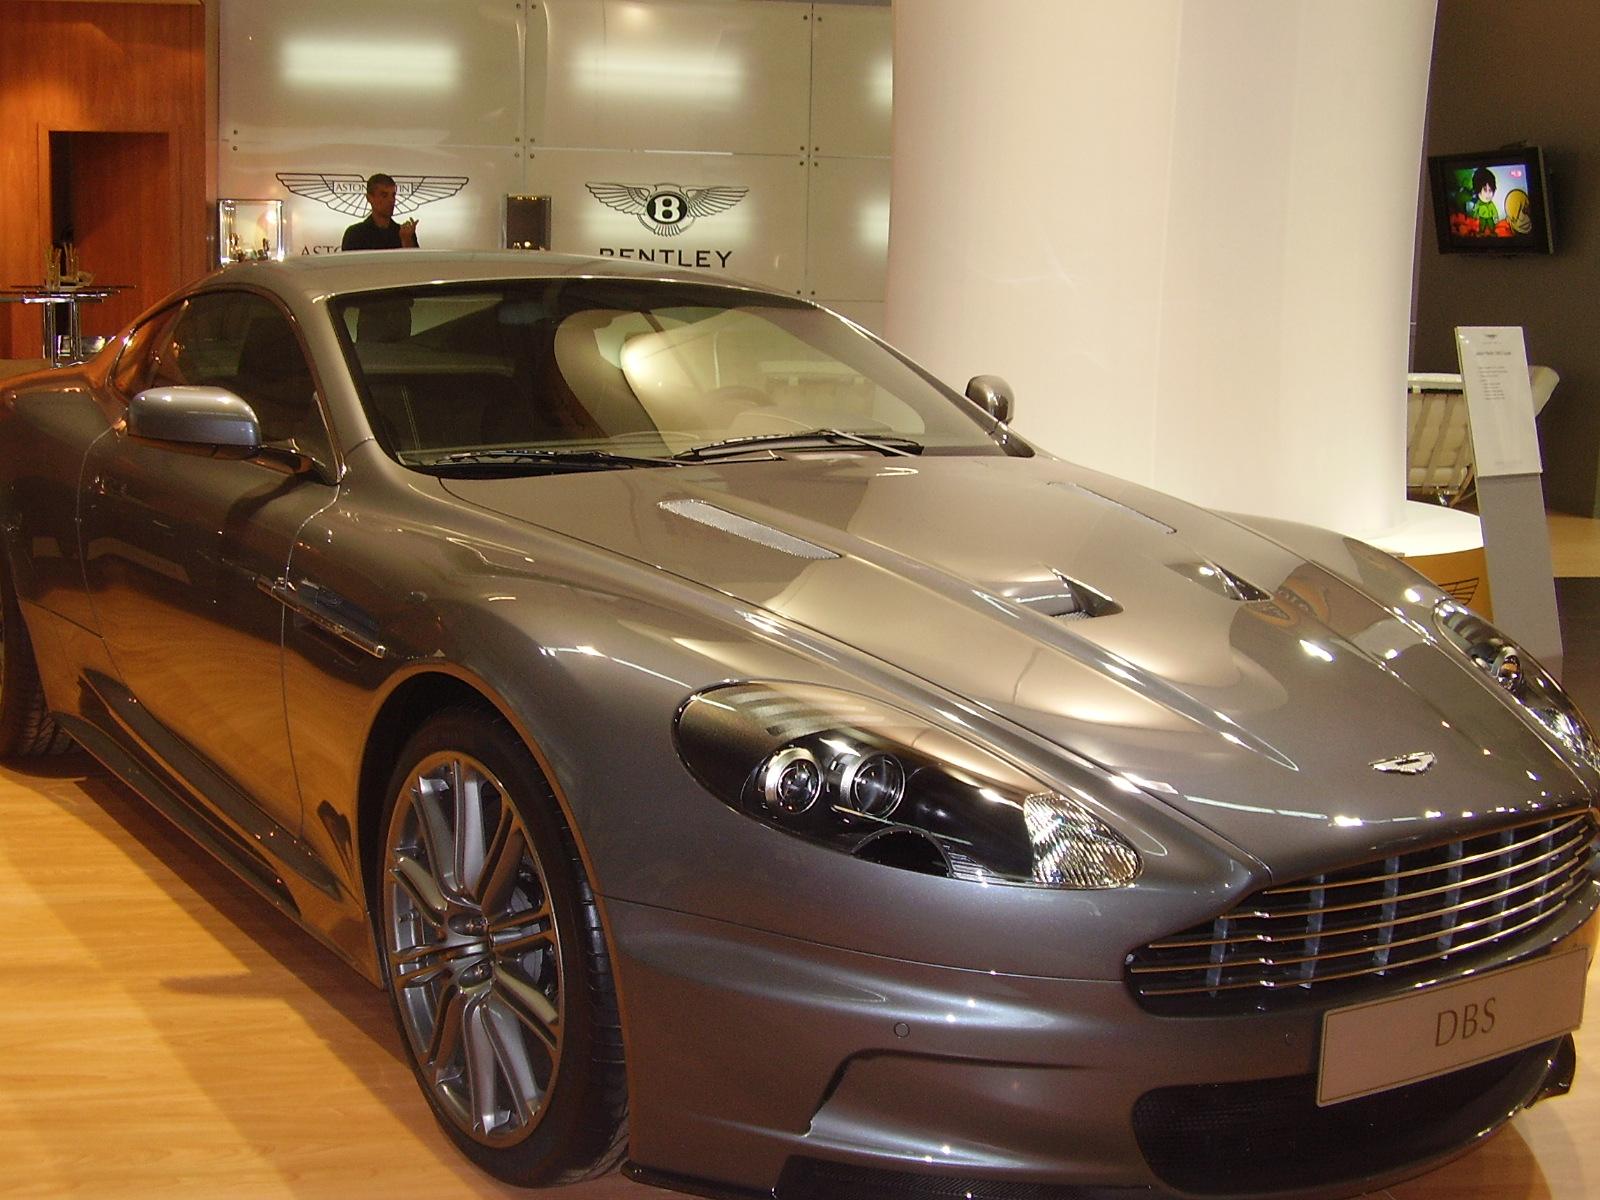 Visita Salon Automovil 09 BCN / Visit to Car Exhibition 09 Barcelona-P5140770.JPG